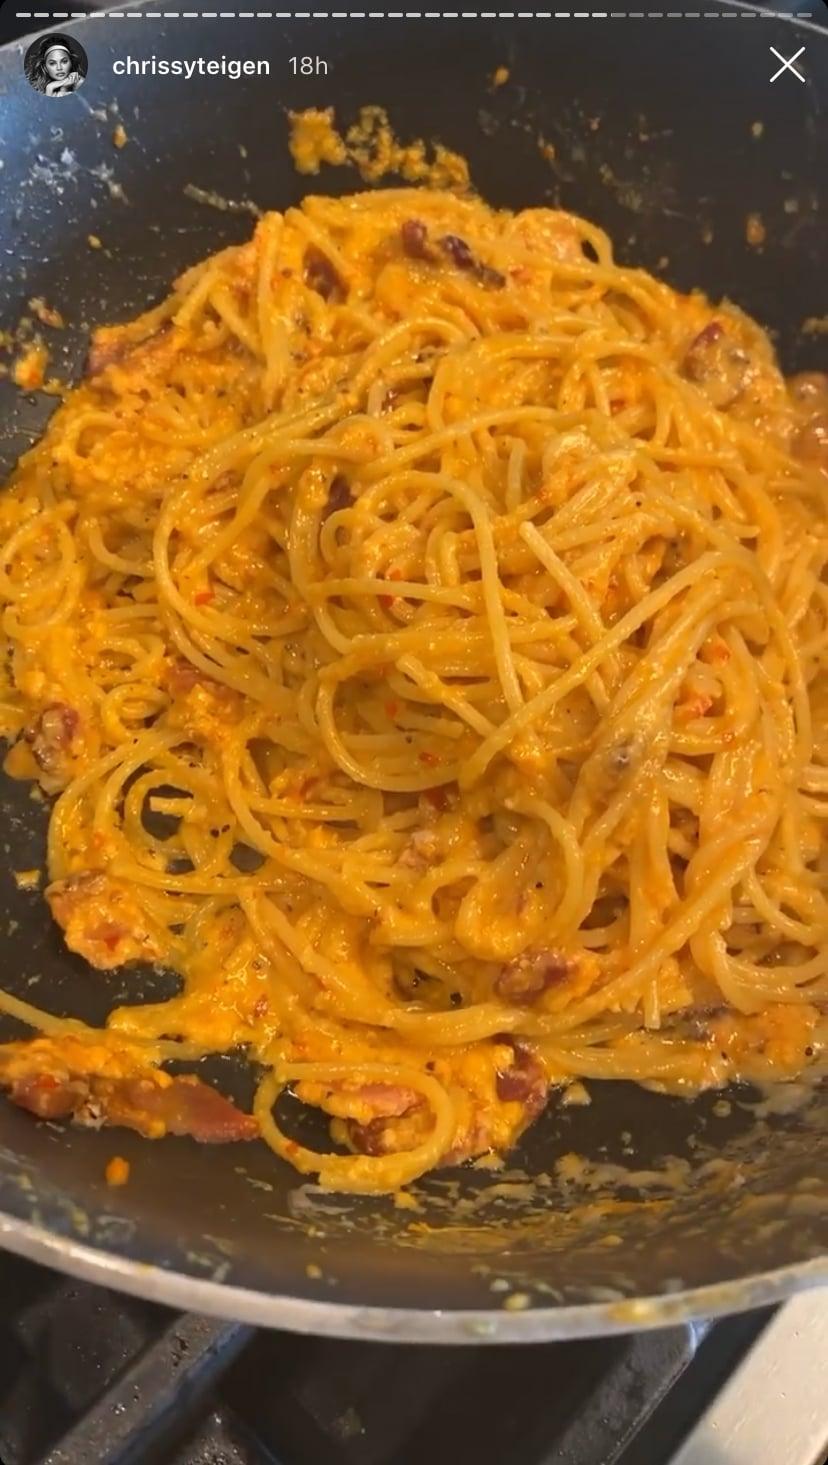 Chrissy Teigen S Spicy Miso Carbonara Pasta Recipe Popsugar Food